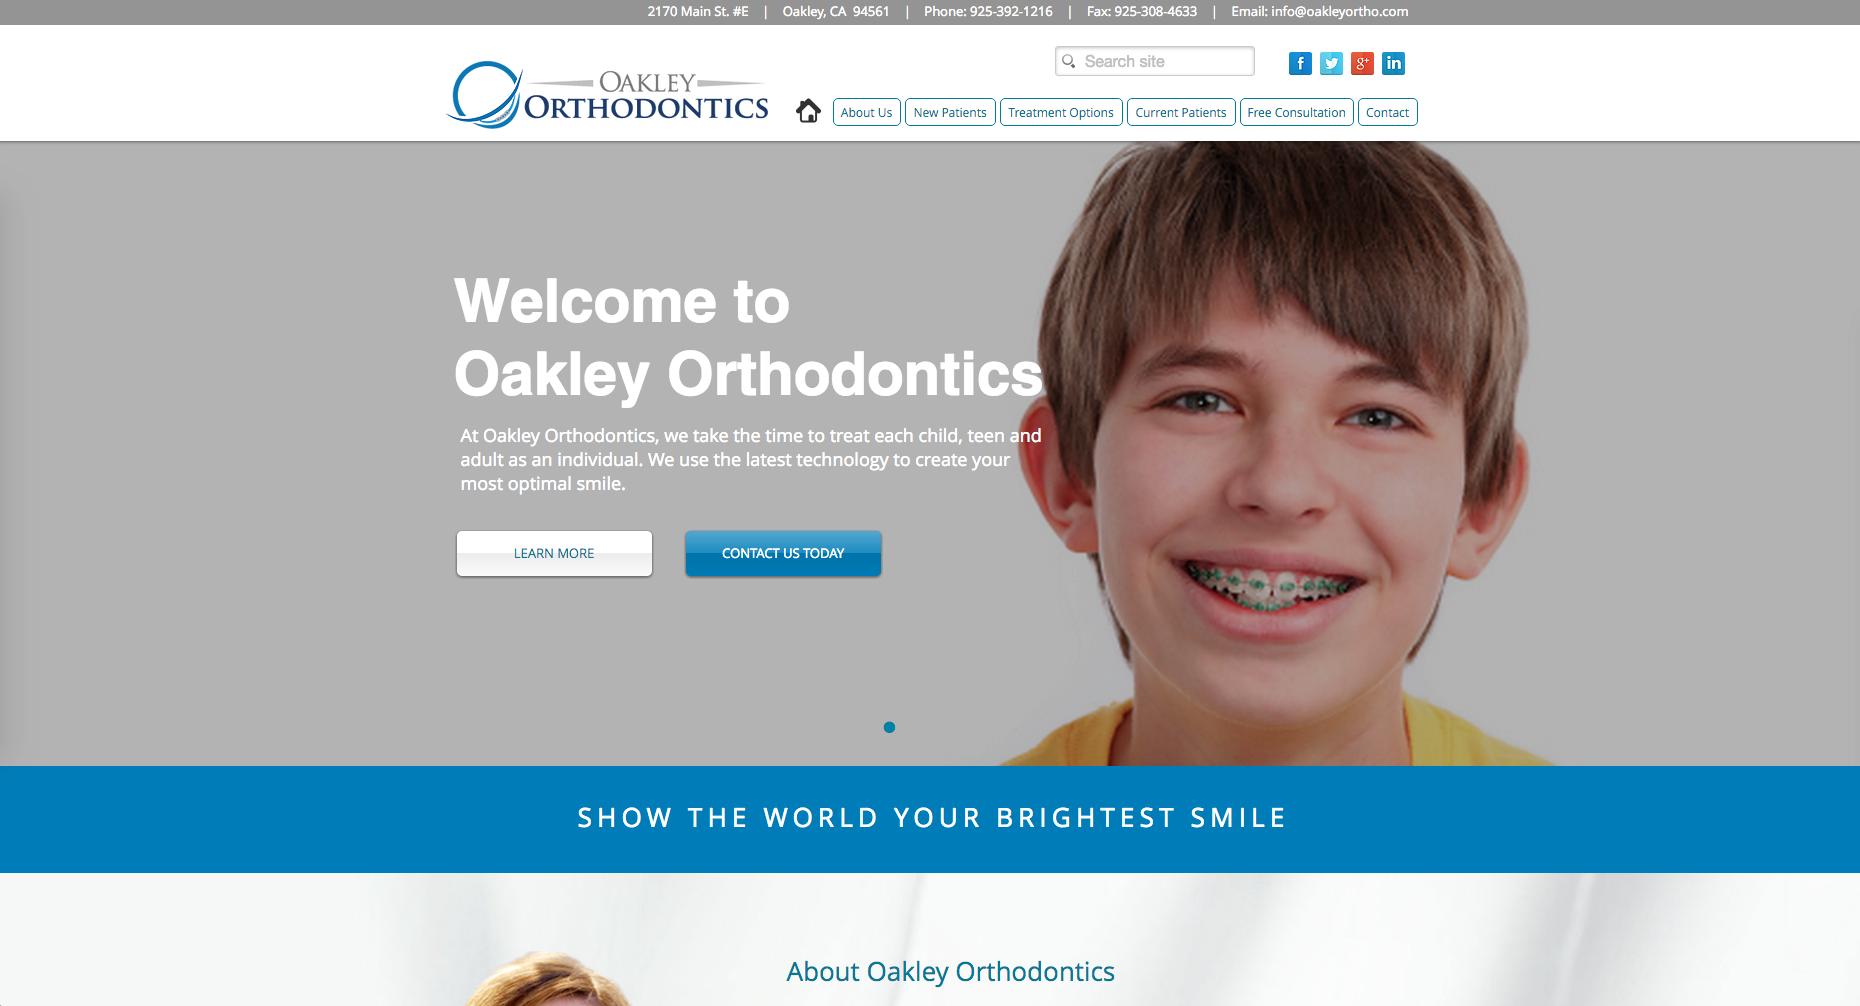 oakley portfolio